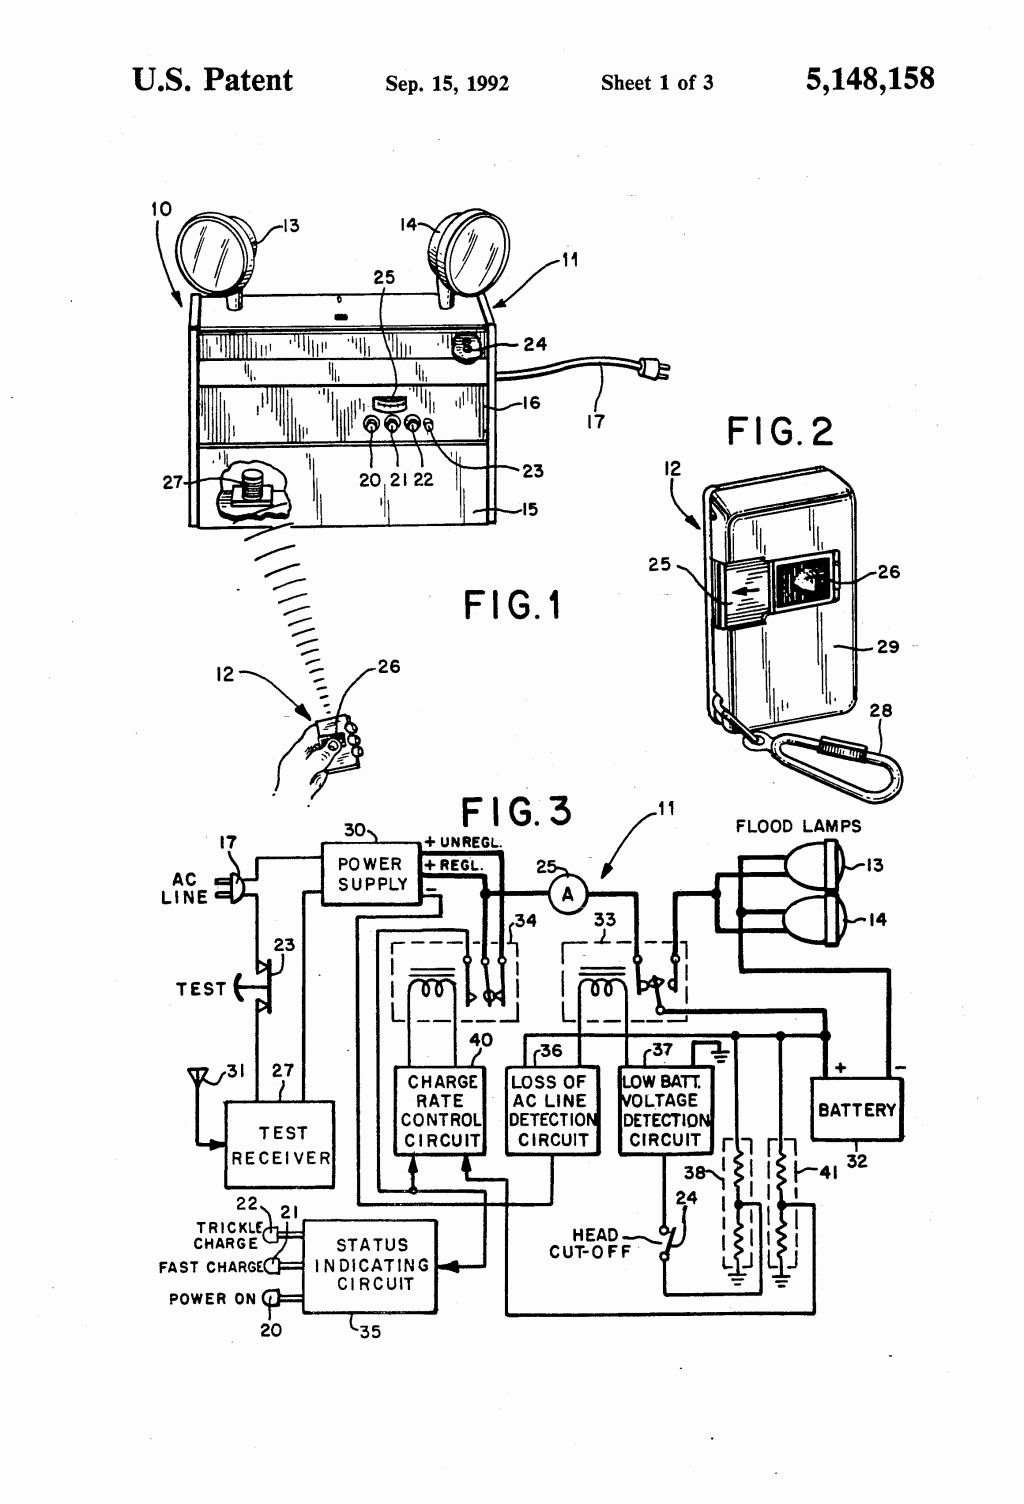 yamaha golf cart wiring diagram along with along with